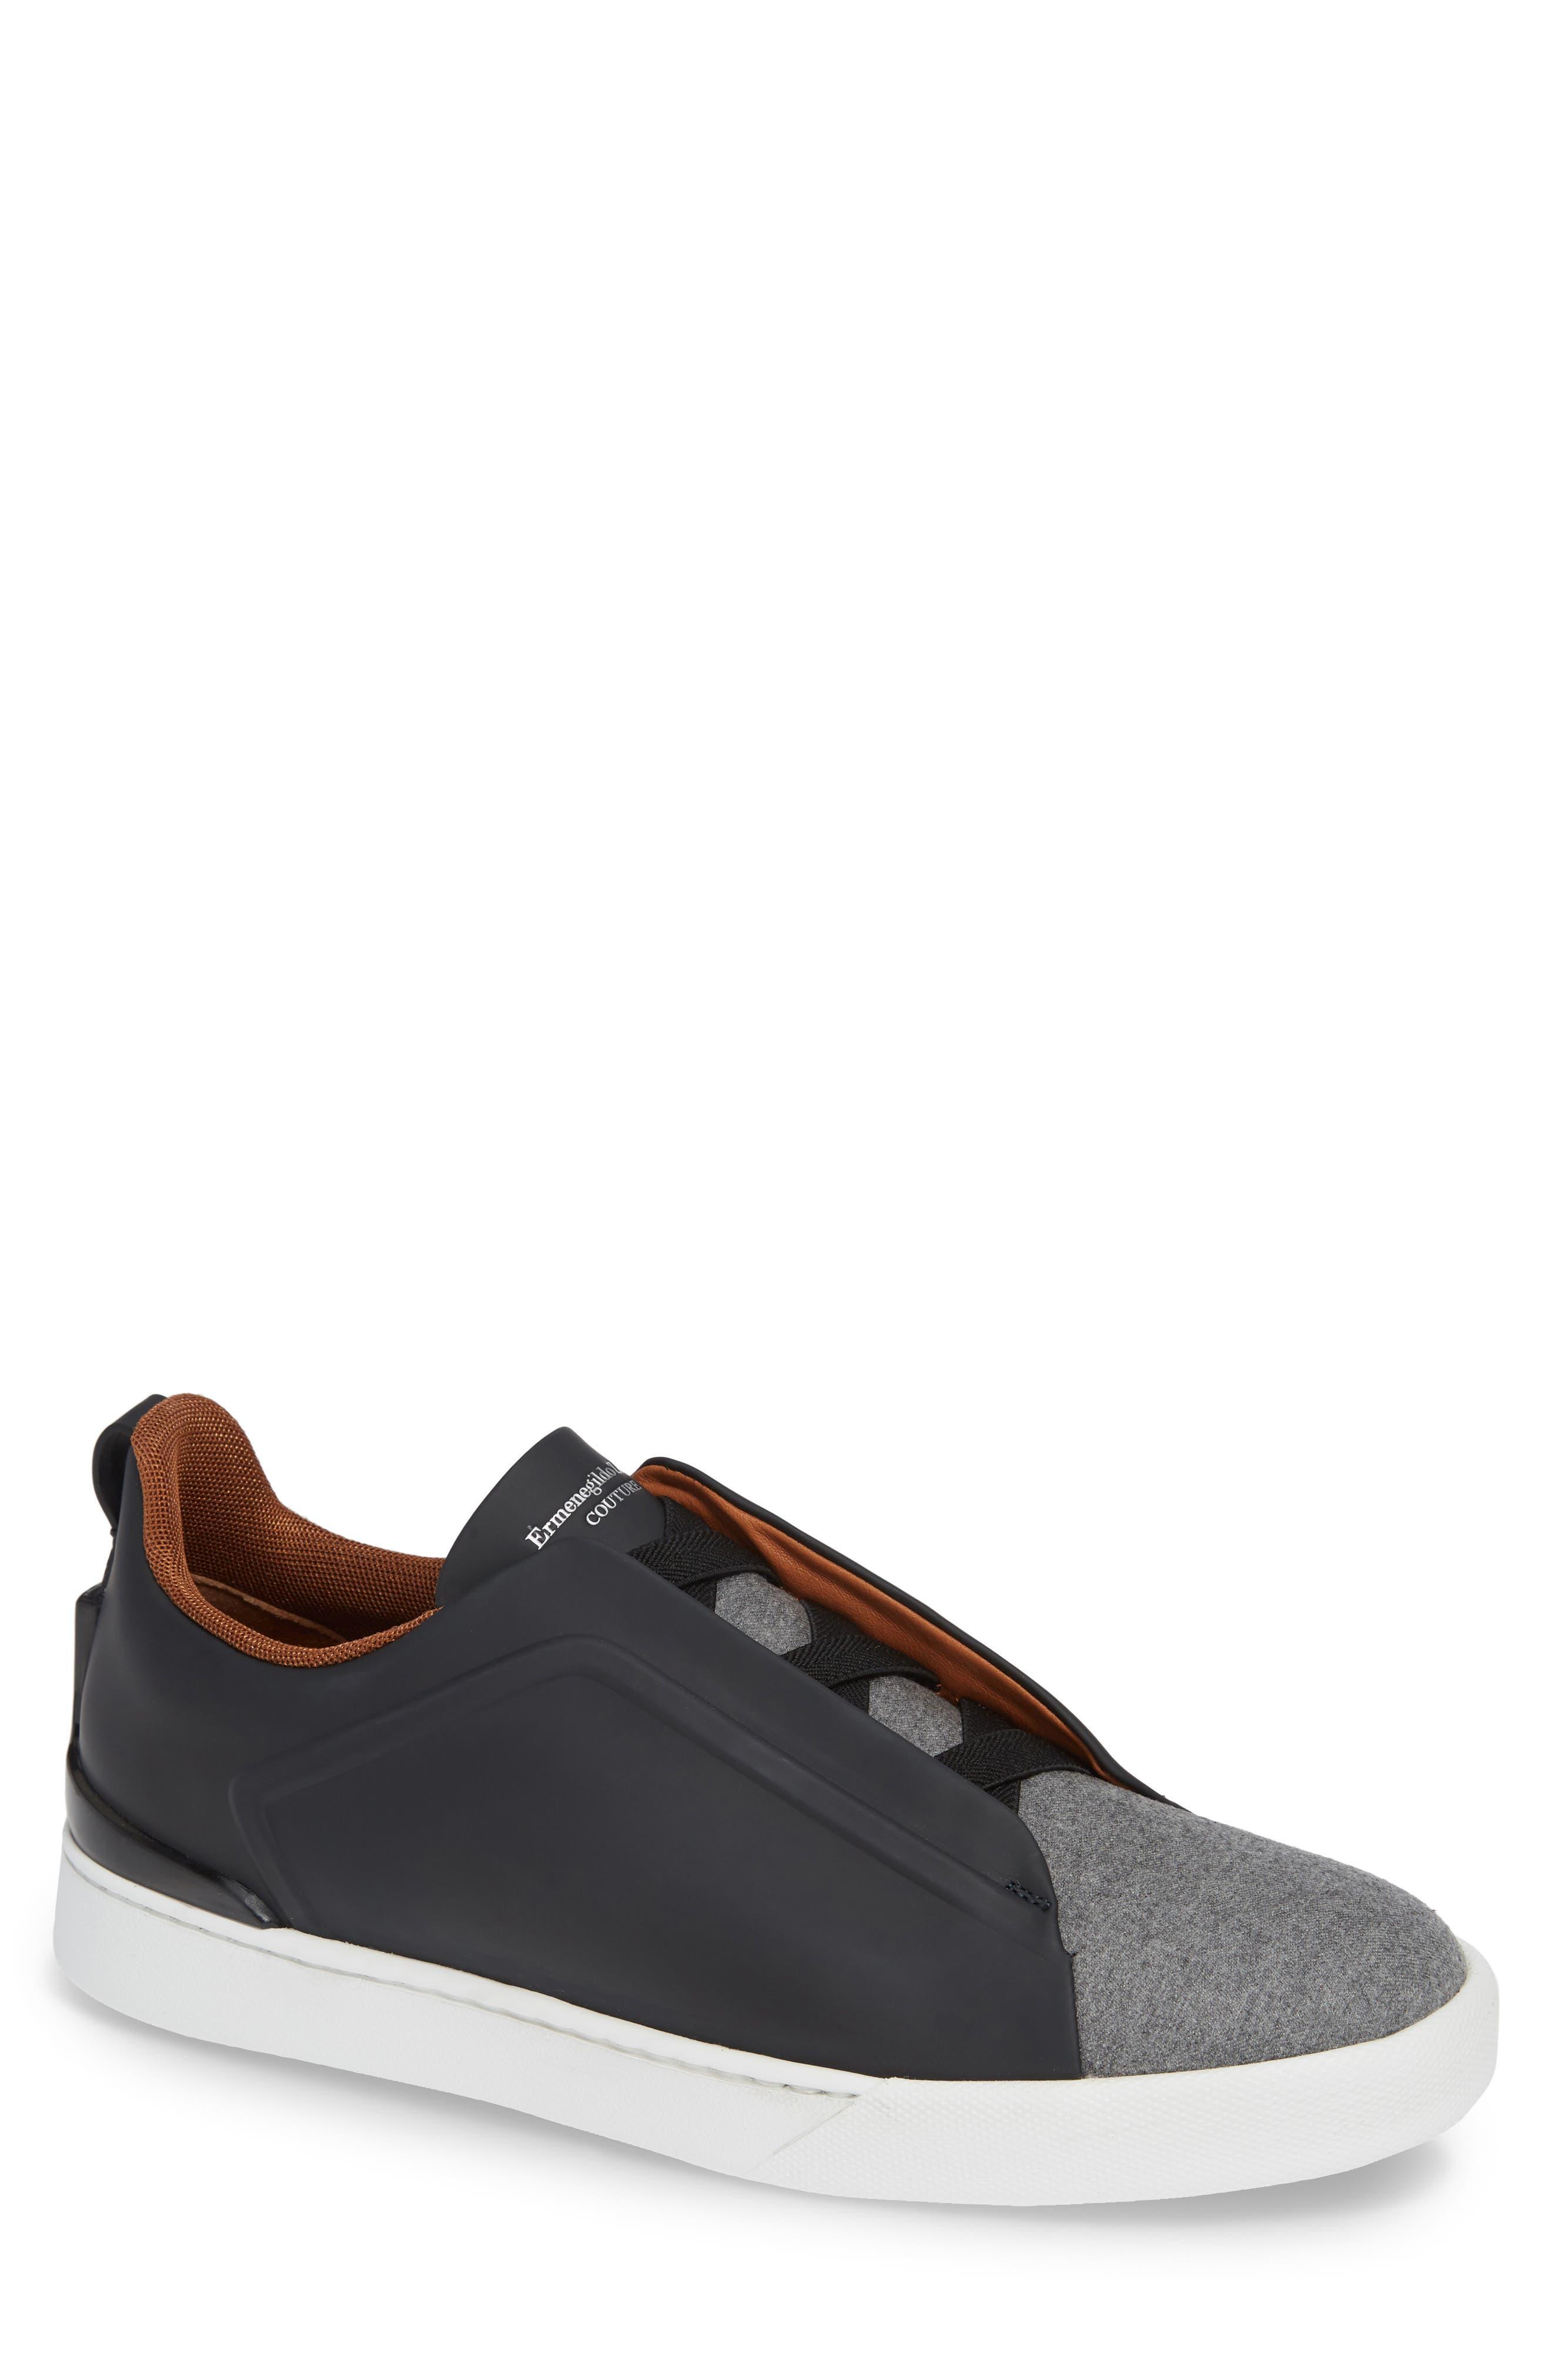 ERMENEGILDO ZEGNA Men'S Triple-Stitch Leather/Wool Low-Top Sneakers in Navy/ Grey